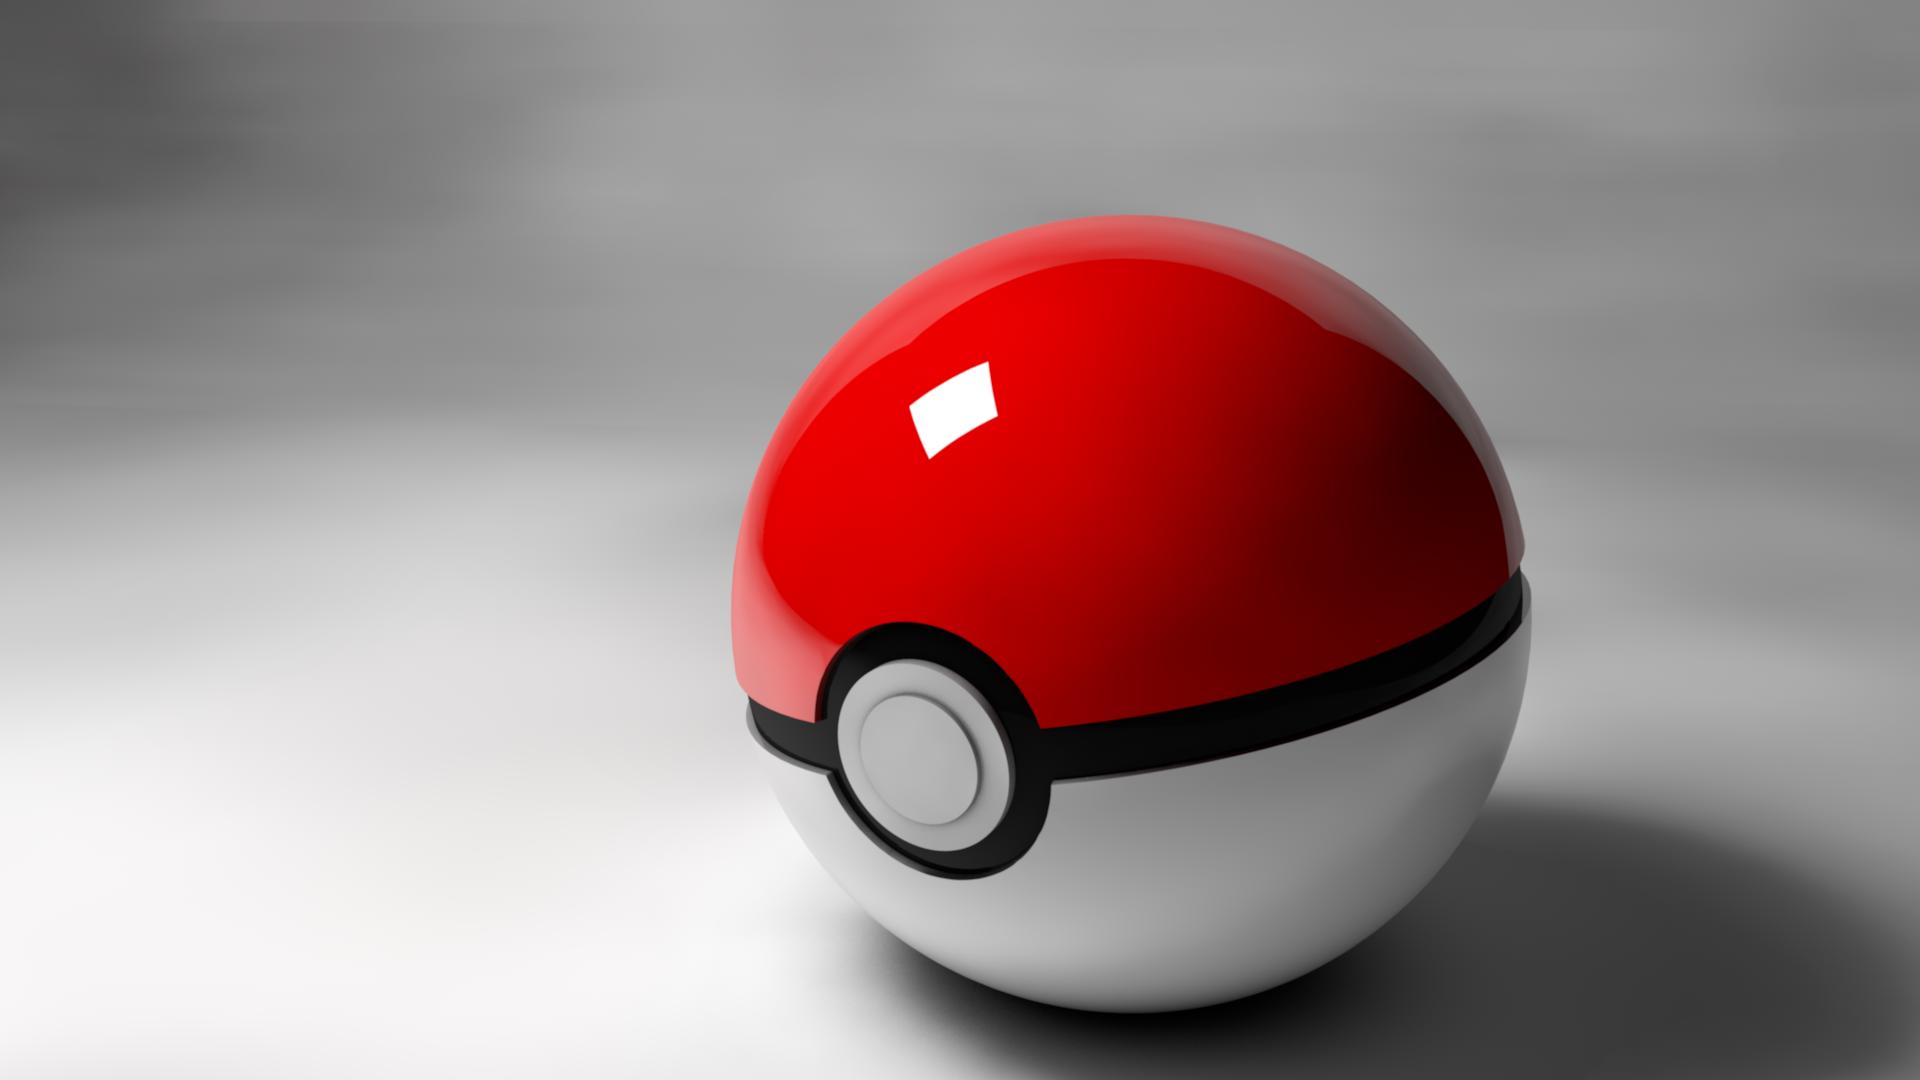 Pokeball Template Pokemon Ball Pokemon Pokeball